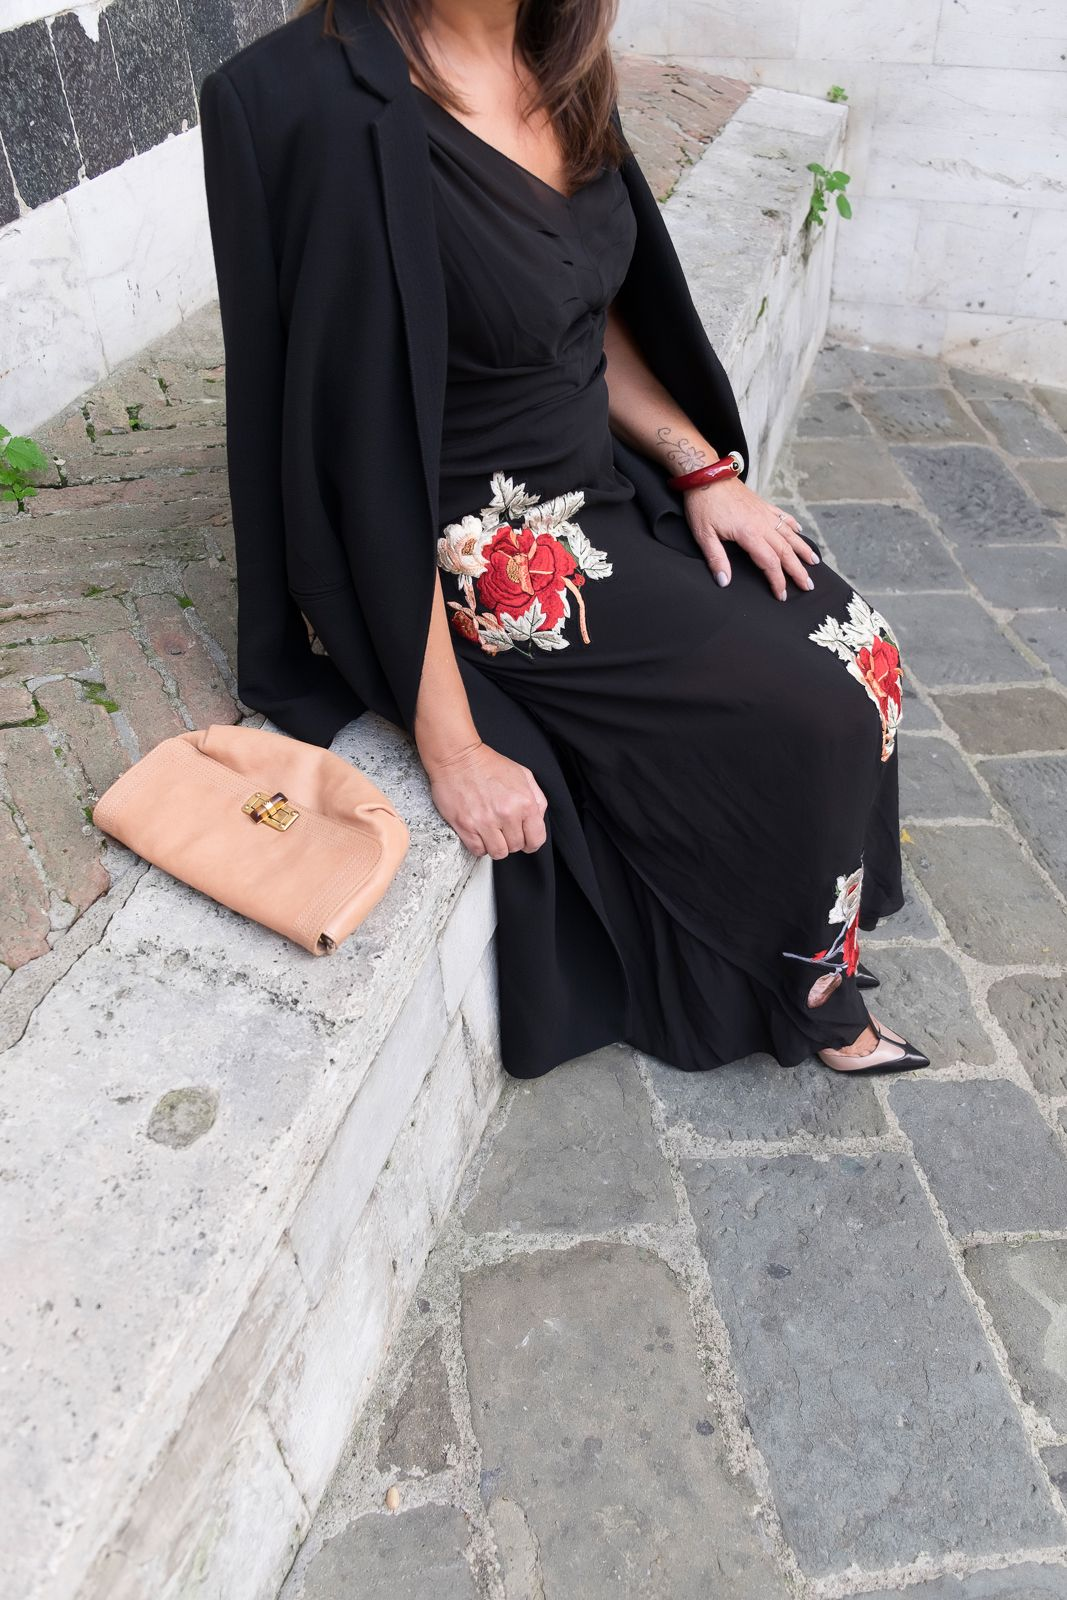 Red flowers on my black dress